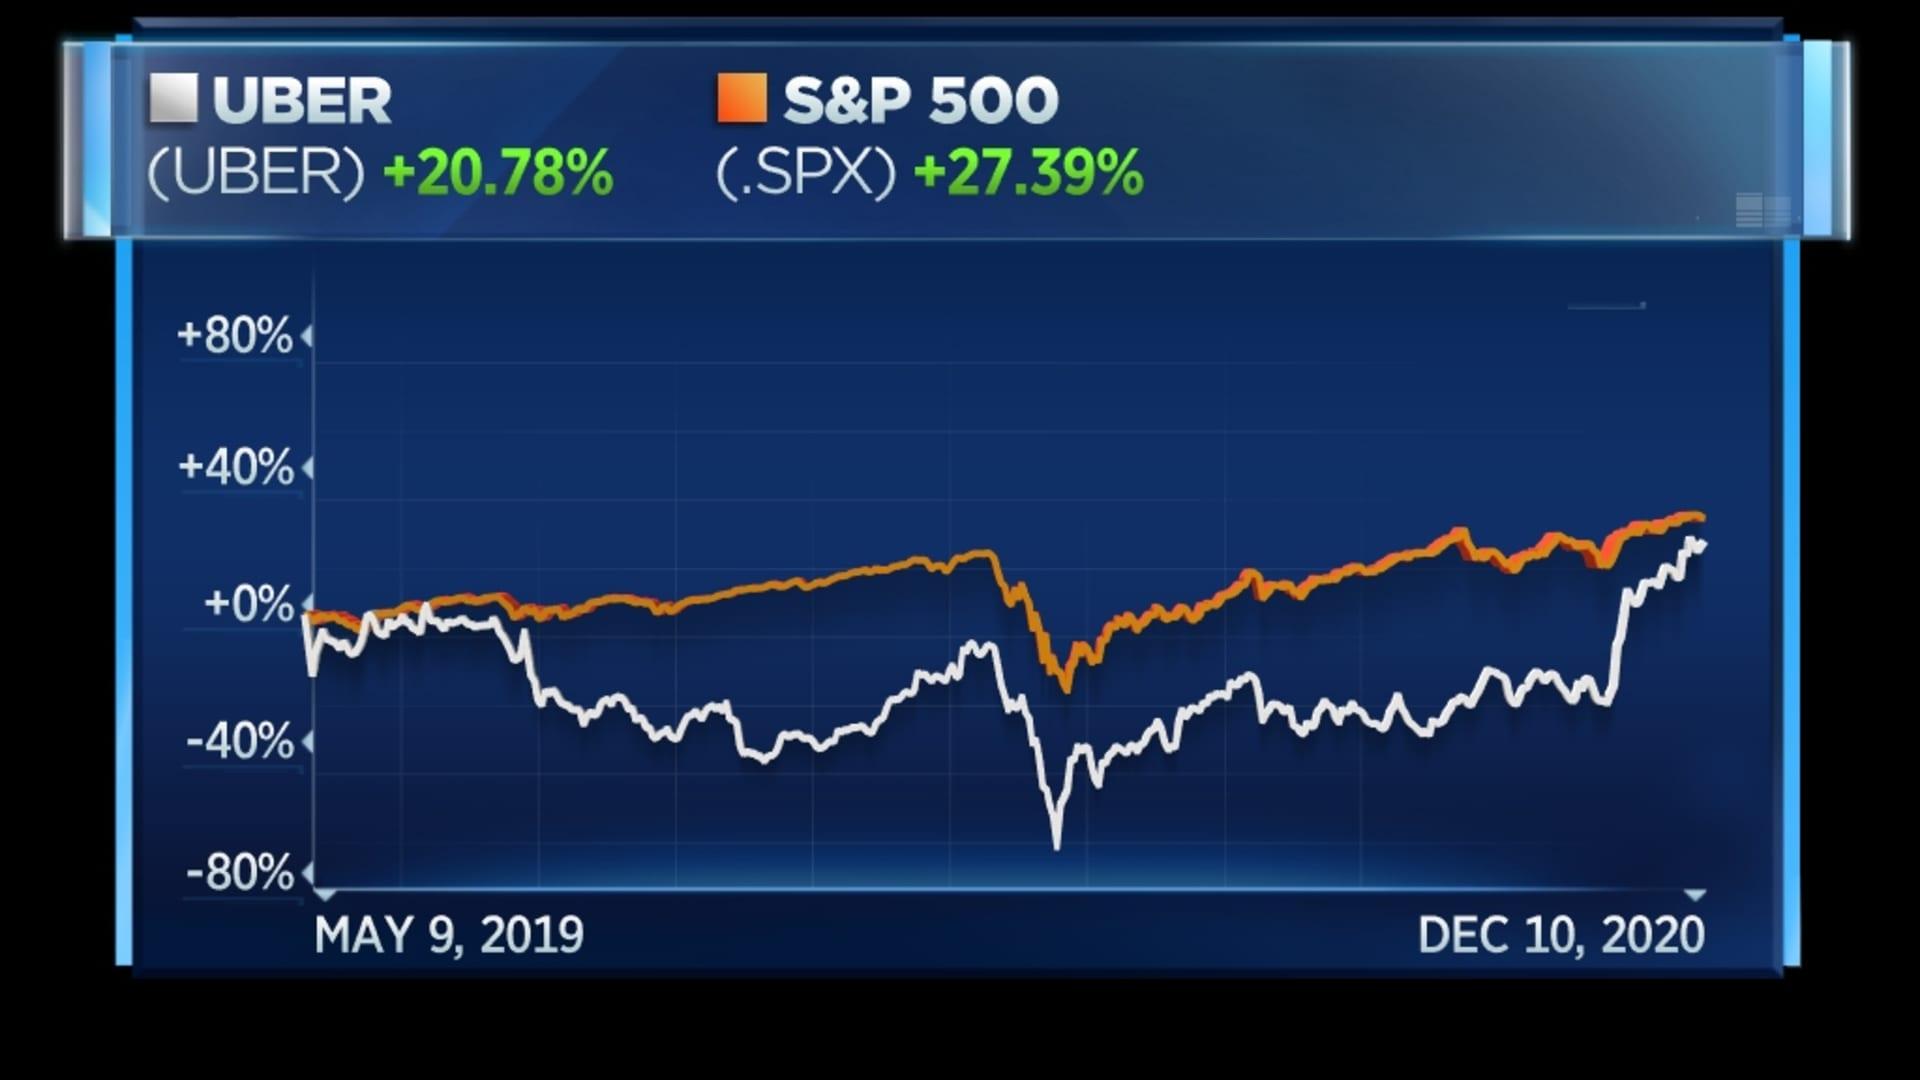 Uber vs. S&P 500